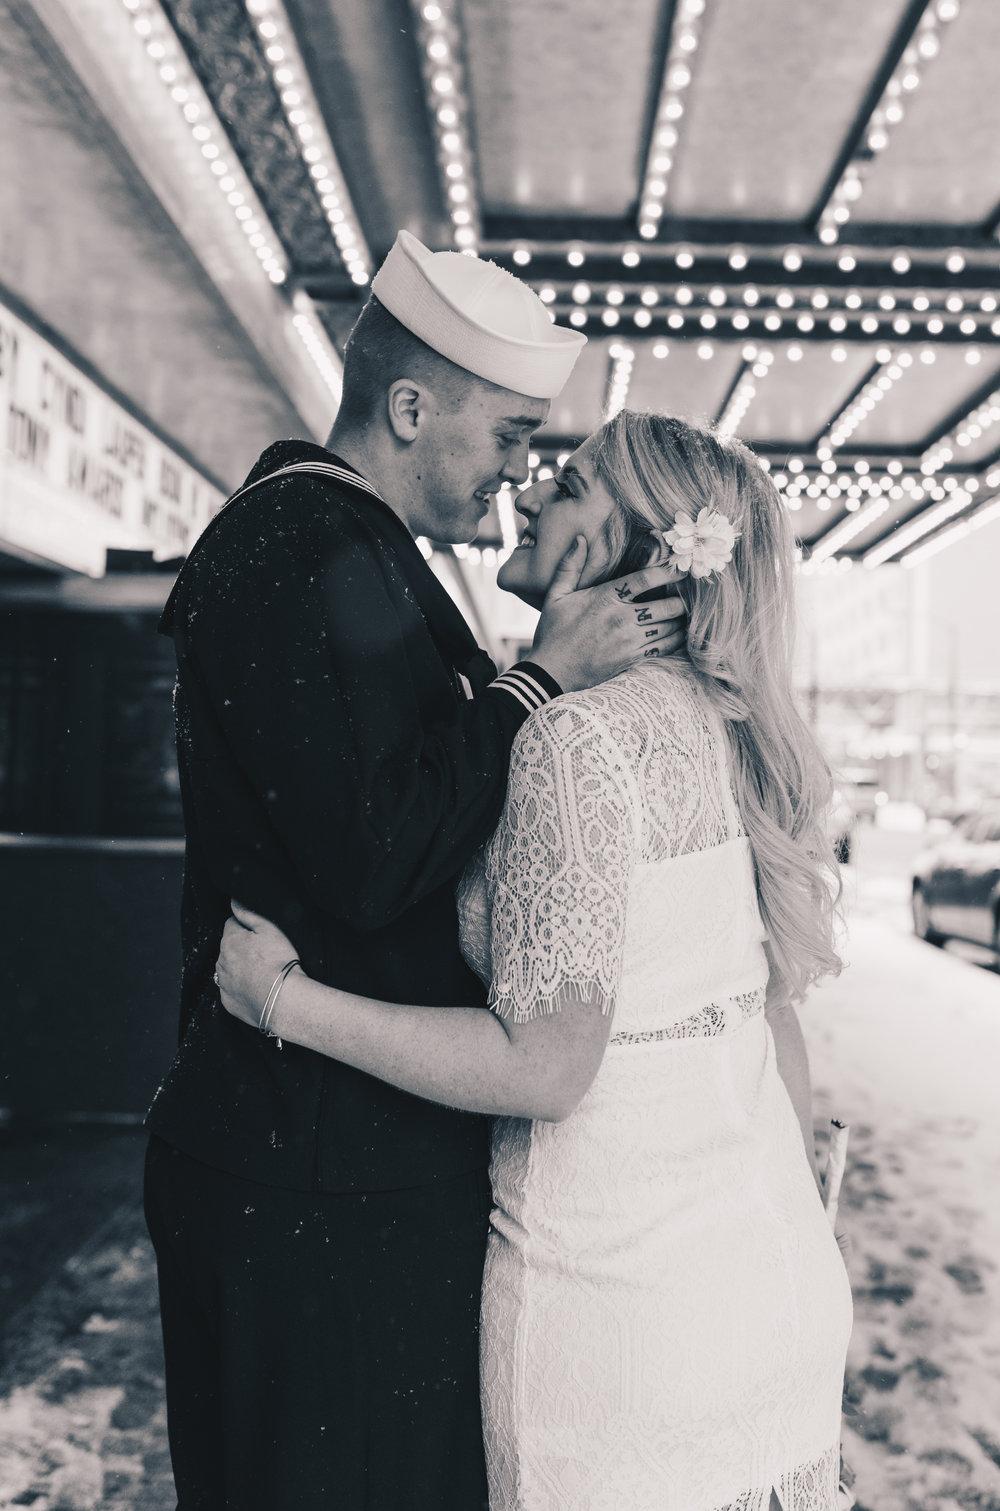 Chicago Courthouse, Chicago Wedding, Chicago Elopement, Chicago Wedding Photographer, Chicago Elopement Photographer, Chicago Lifestyle Engagement